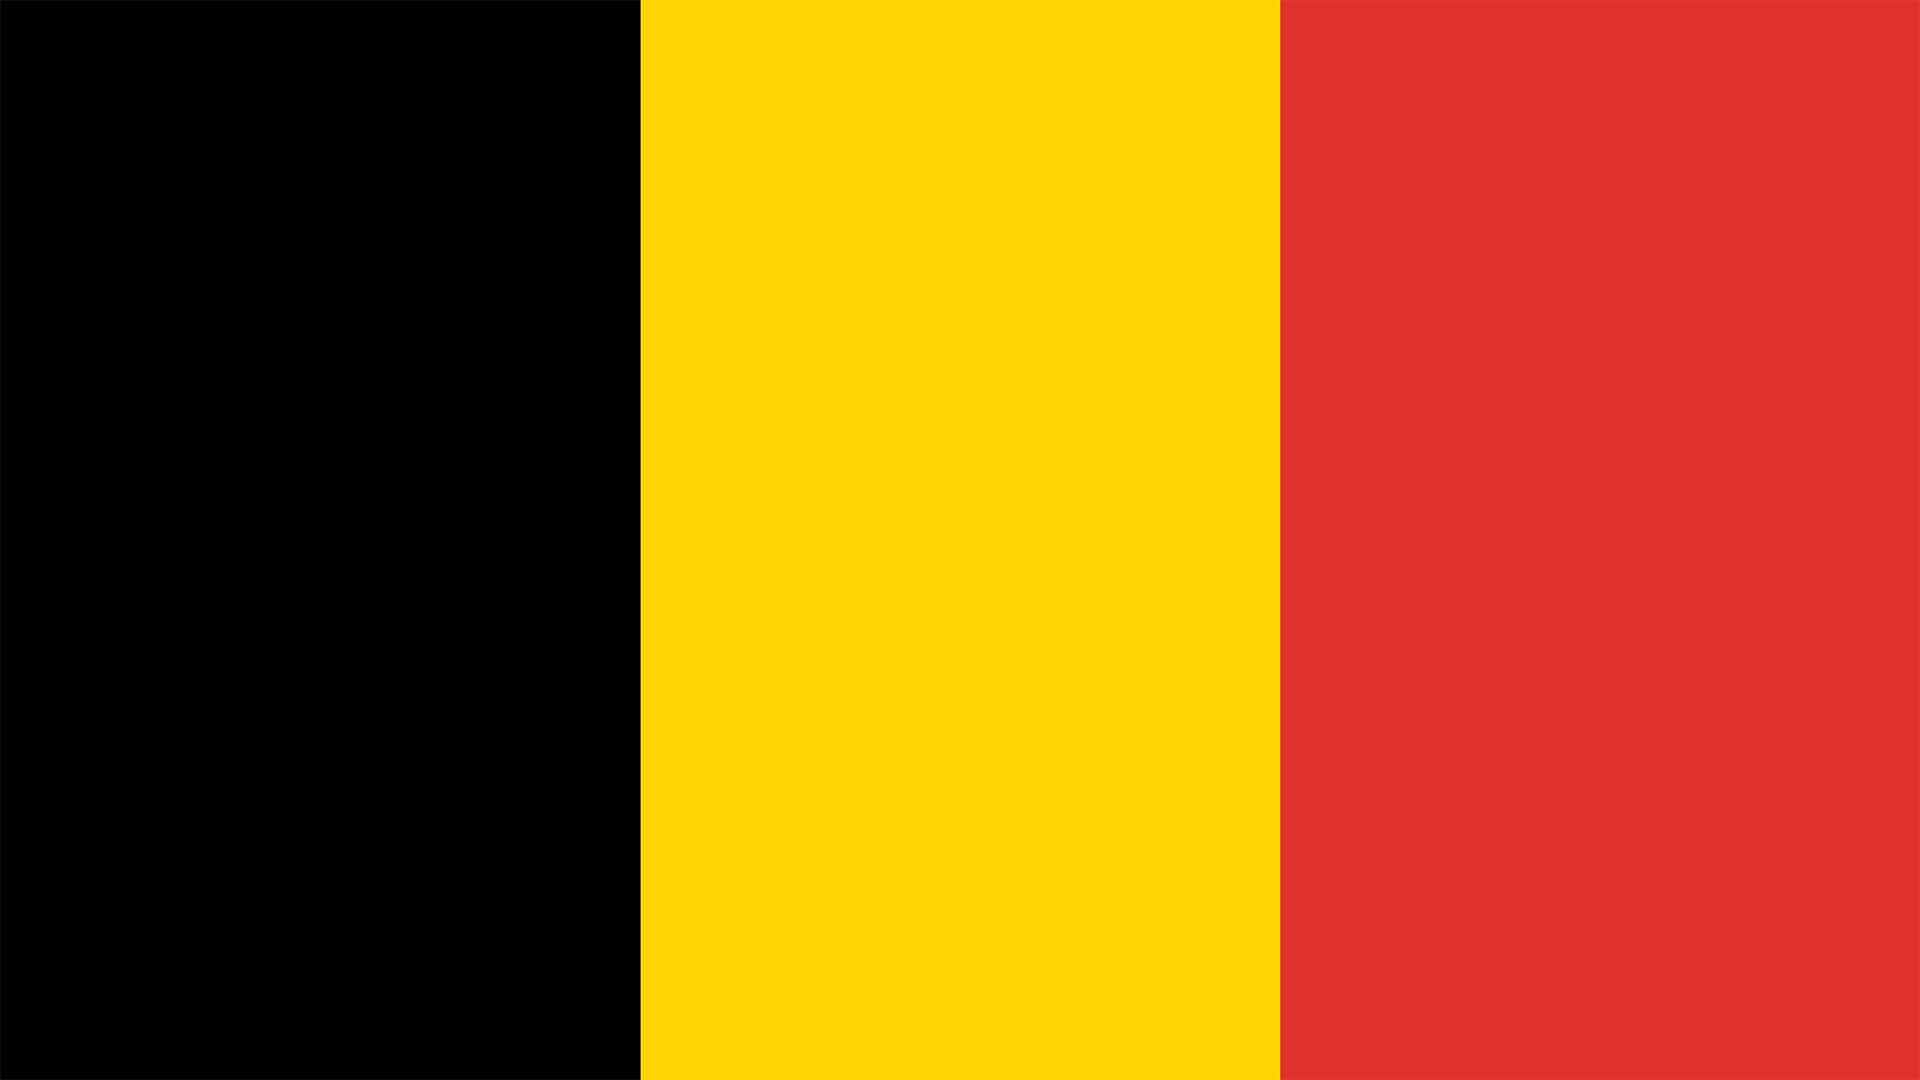 Flagge Belgiens Hintergrundbilder